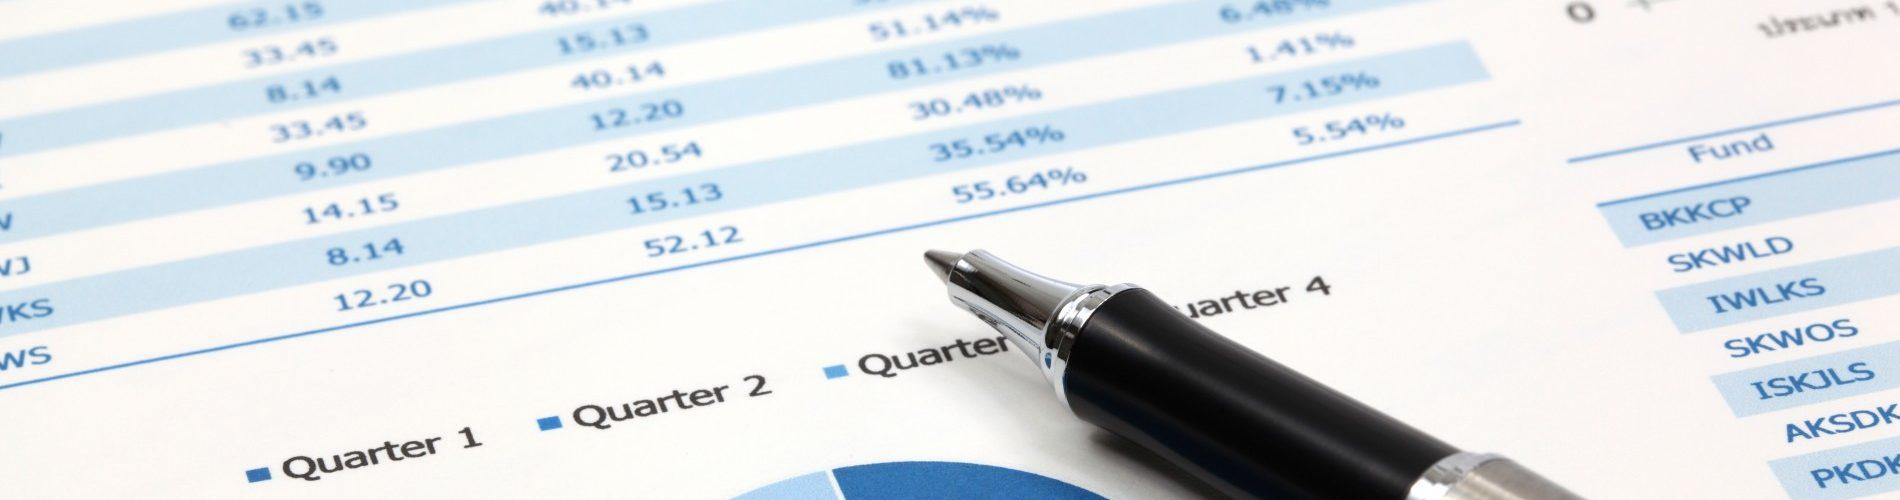 Corporate Tax Returns